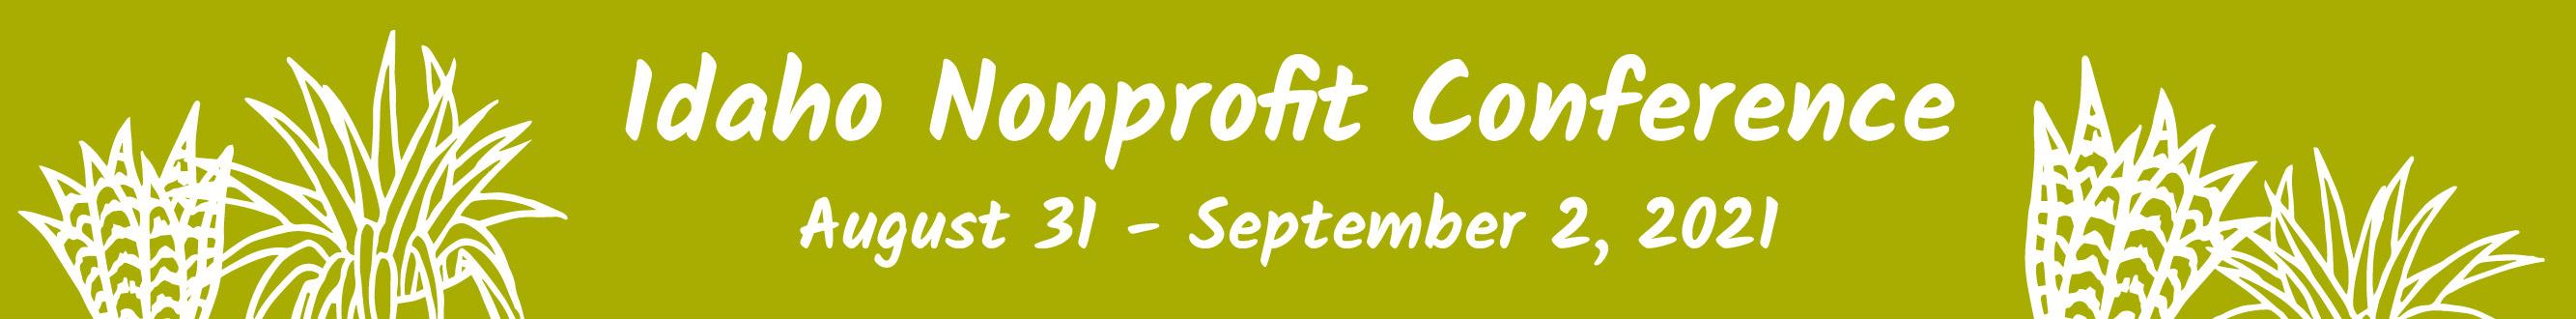 Idaho Nonprofit Center Conference